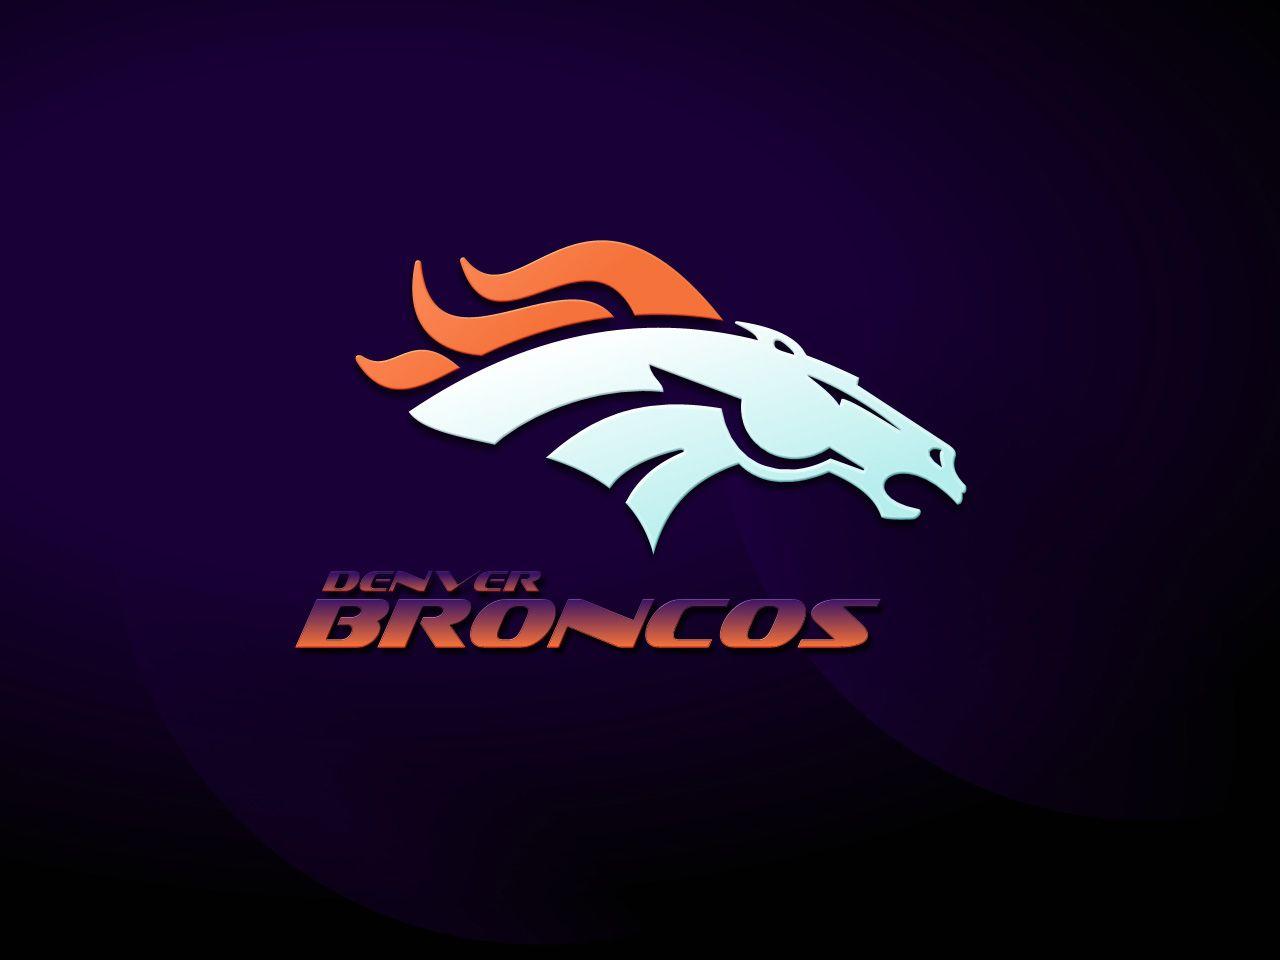 Denver Broncos Pictures Wallpaper Nfl Wallpapers Football